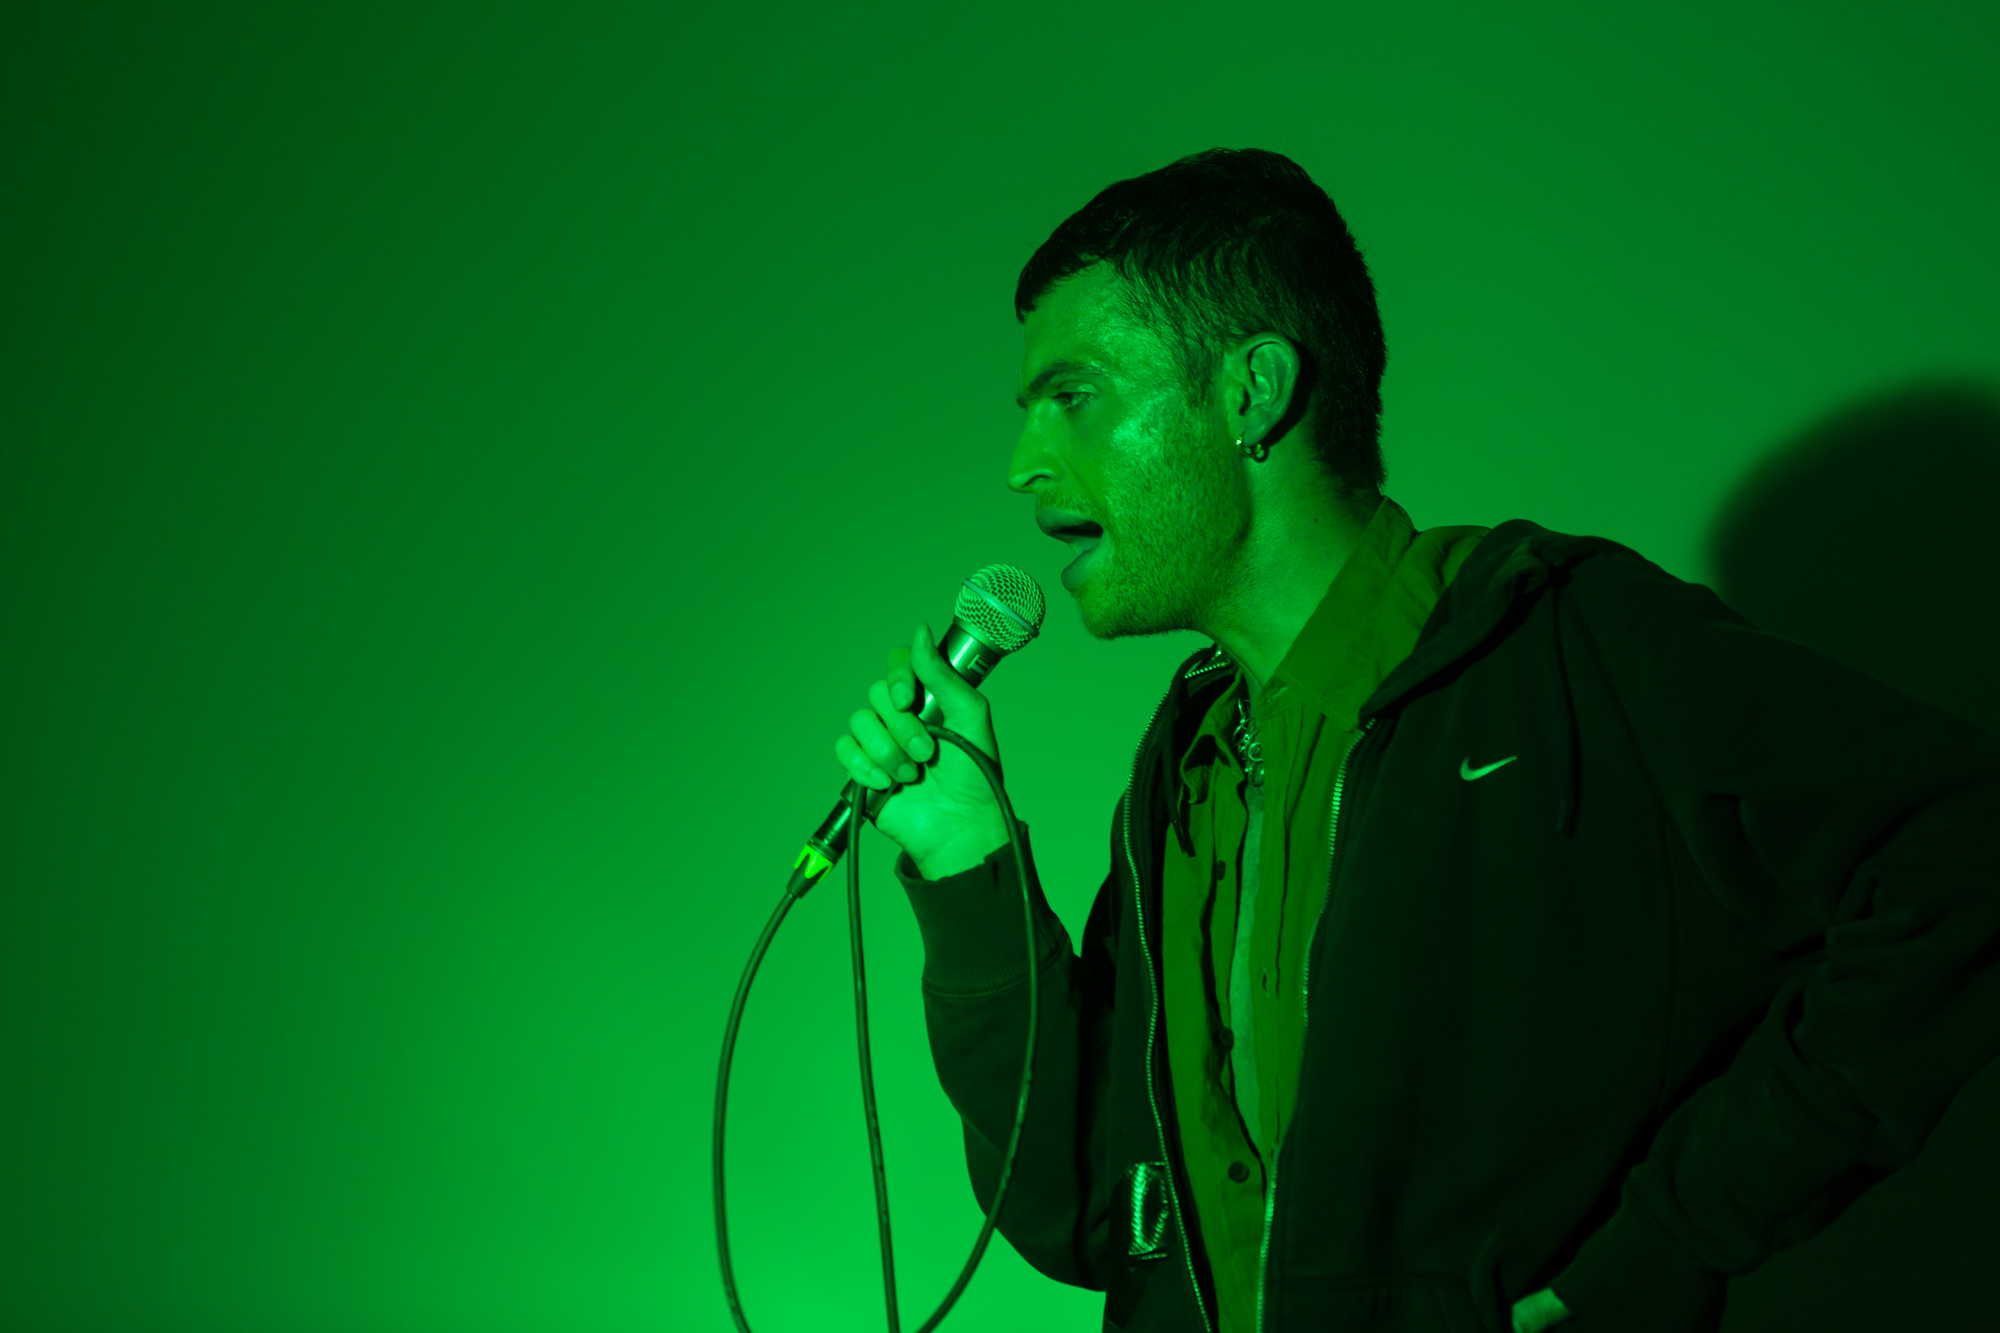 Mathias Ringgenberg aka PRICE,  Greatest Hits, Performance,July 13, 2016, Stadtgalerie Bern,Photo: Matt Cianfrani